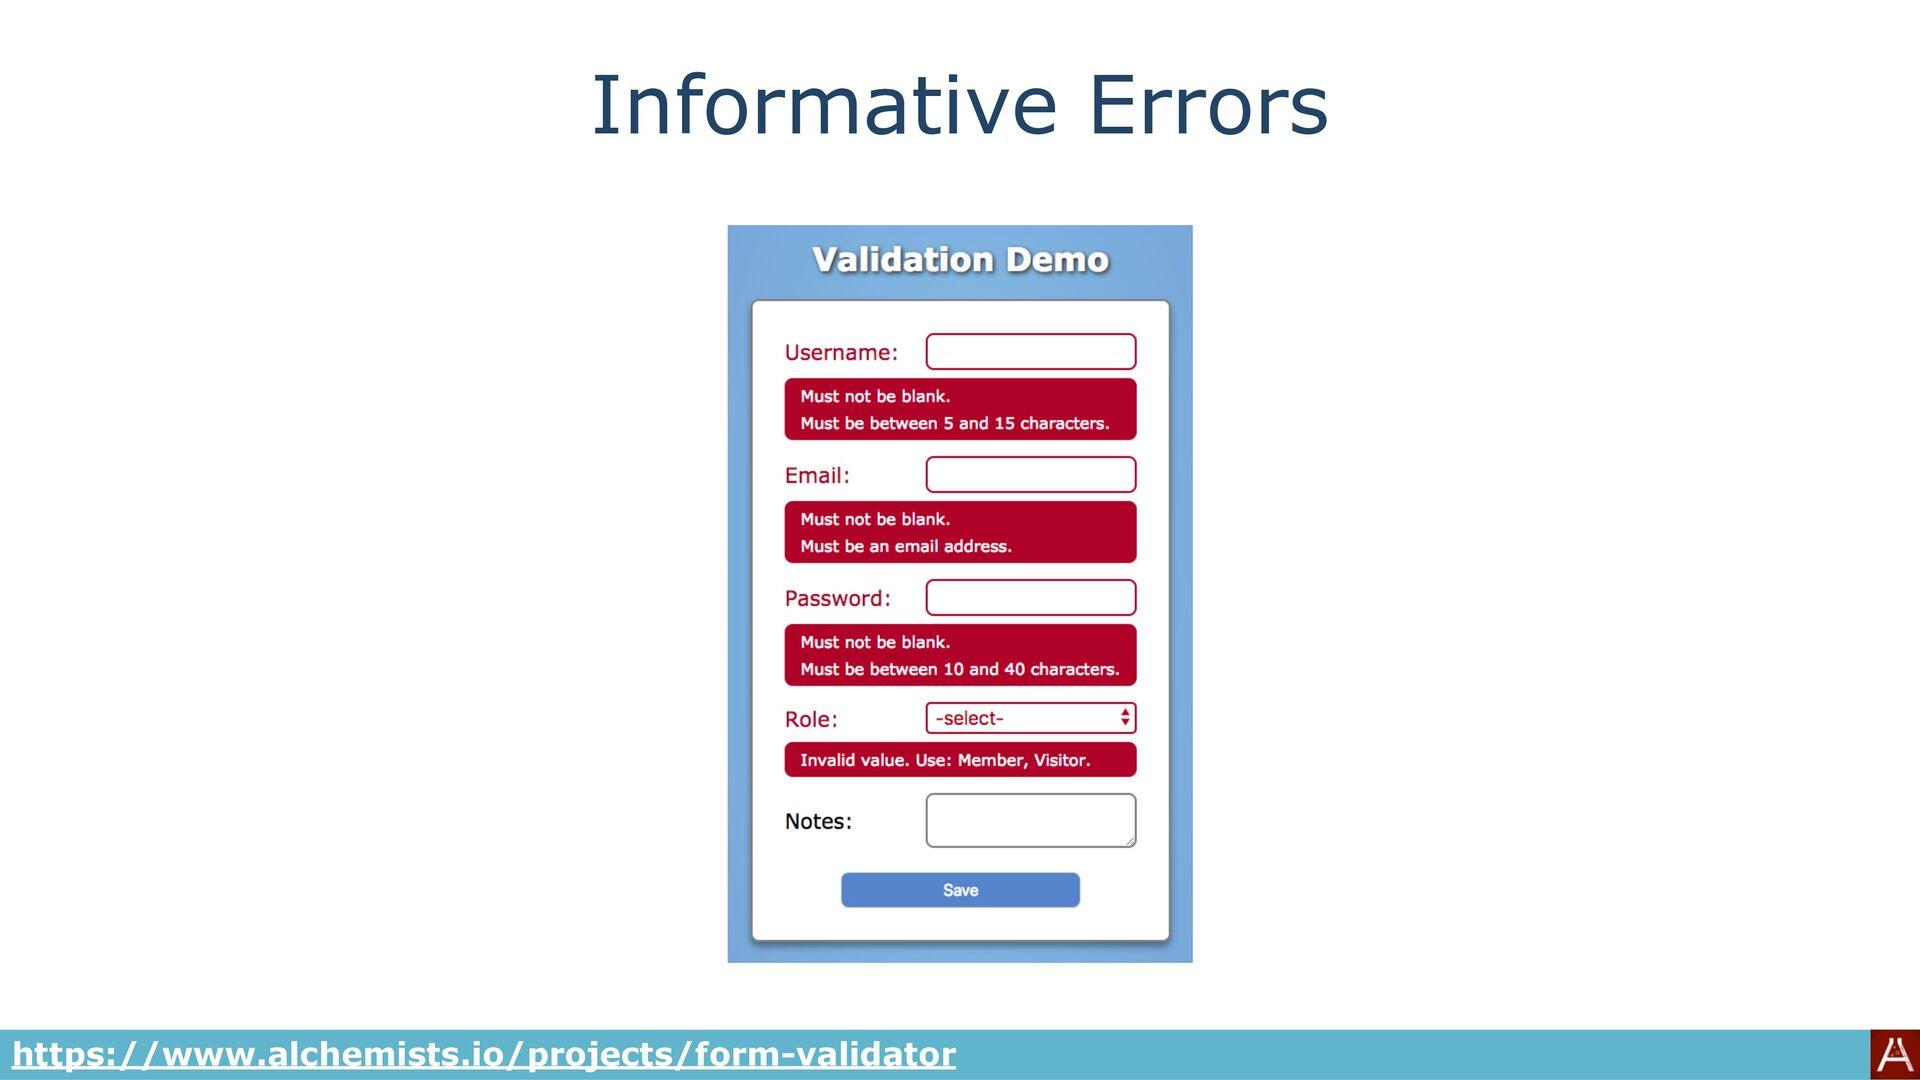 Informative Errors https://www.alchemists.io/pr...